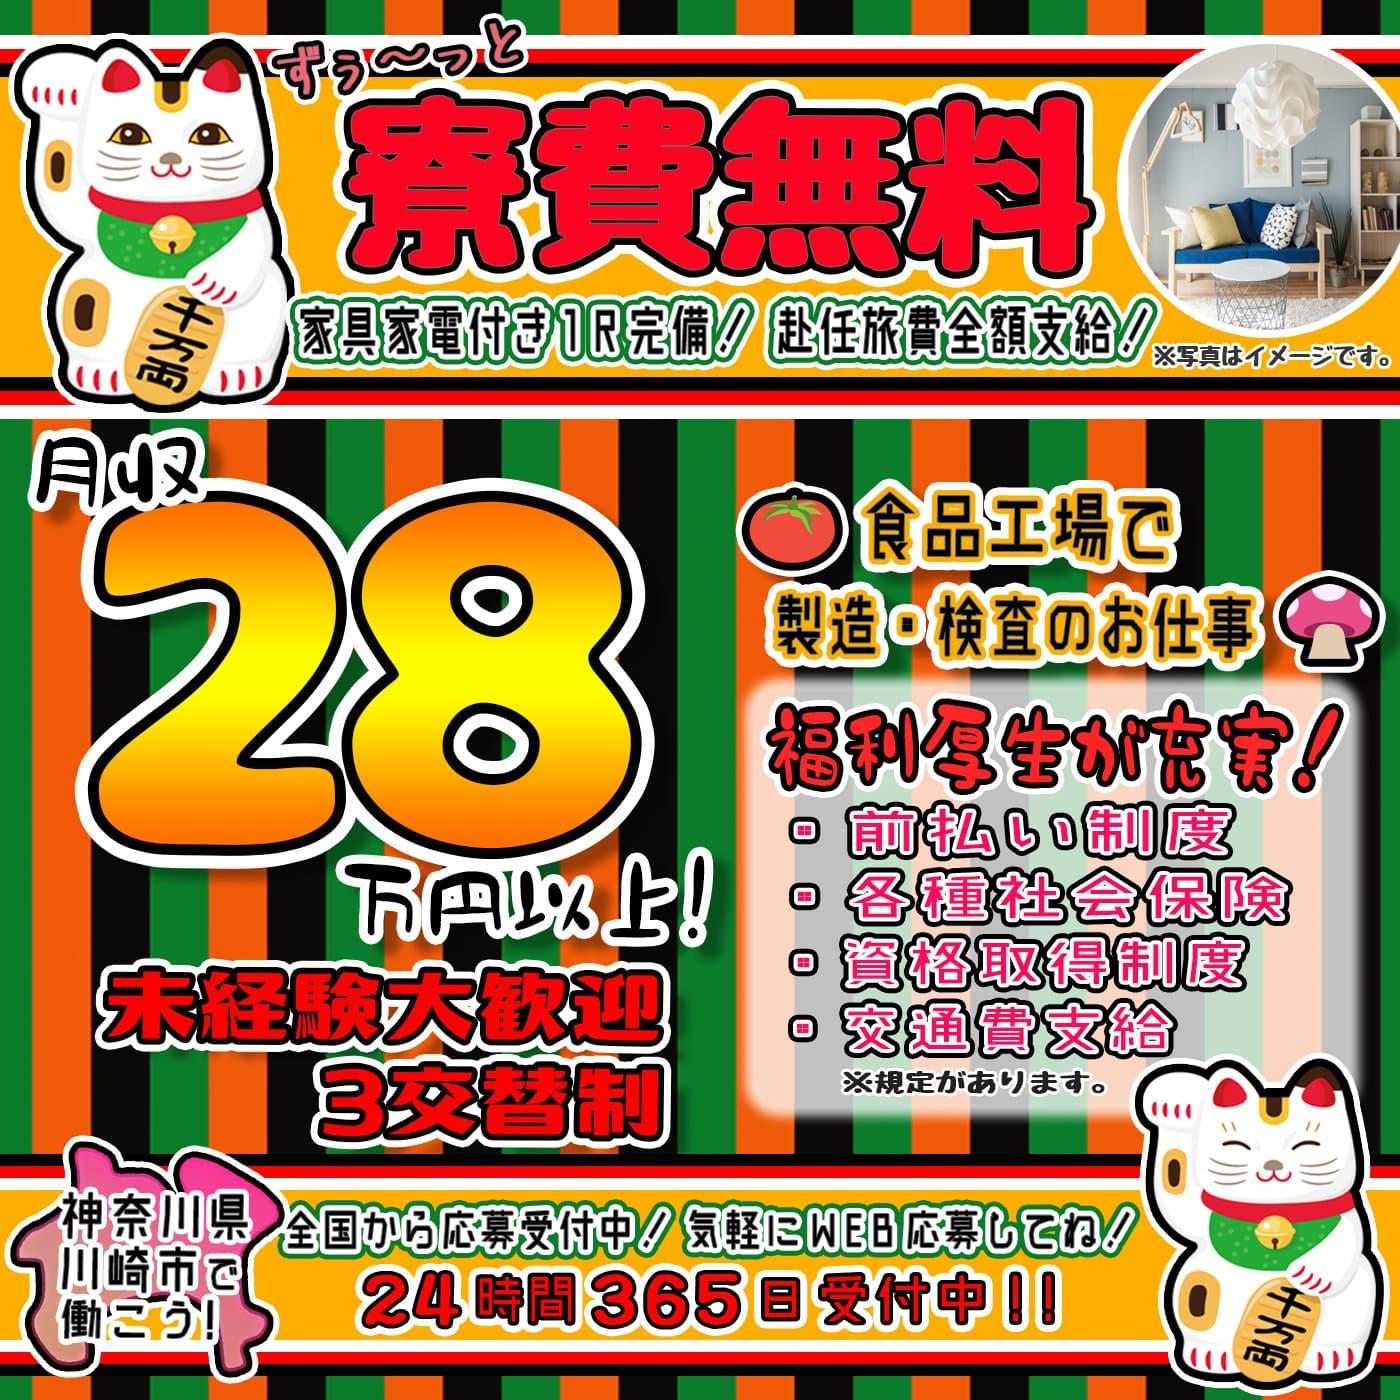 Special 12